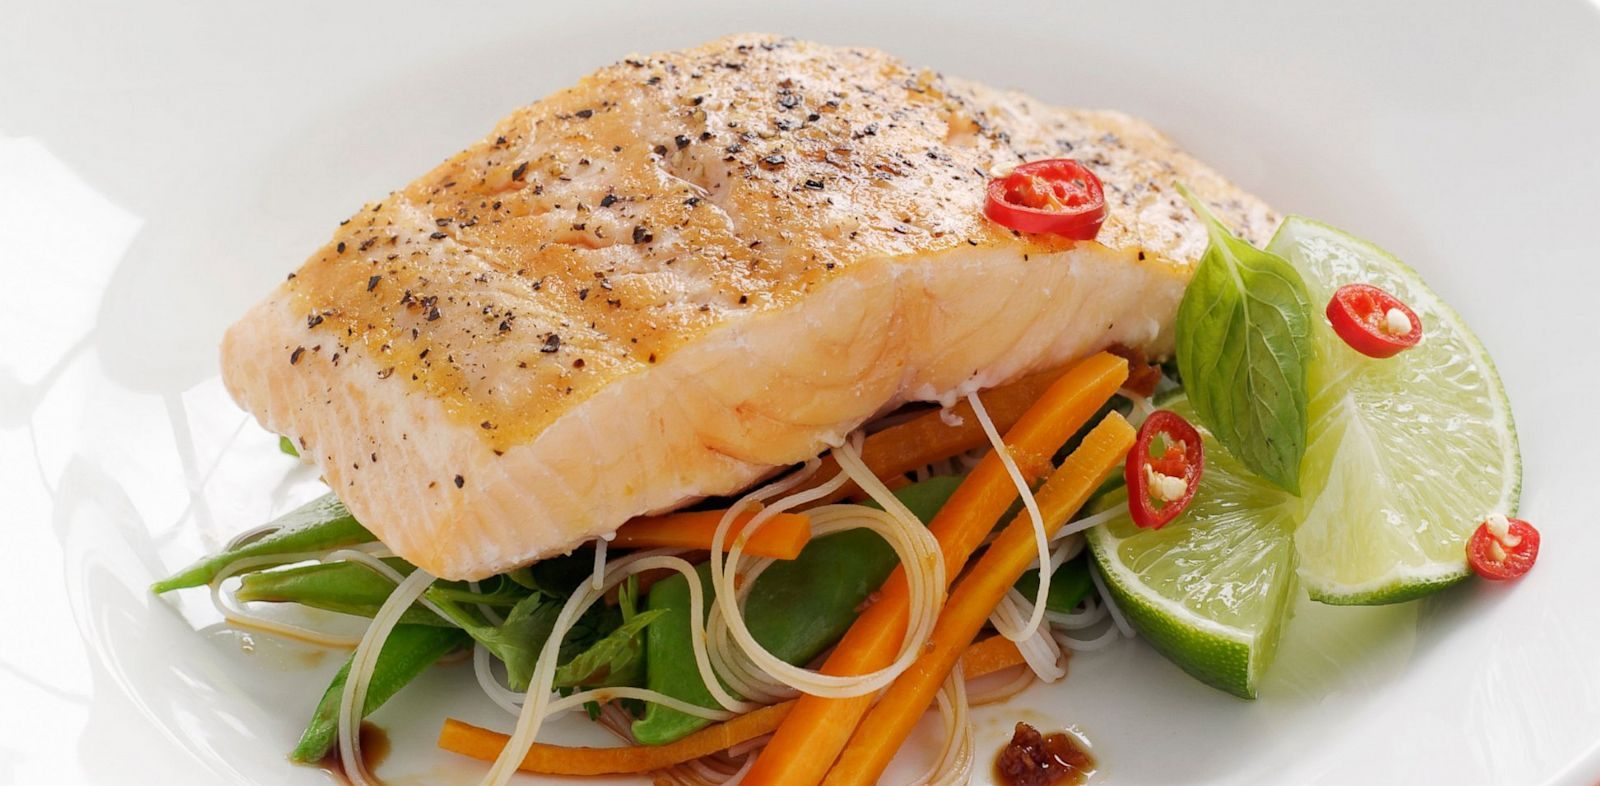 PHOTO: mislabeled seafood